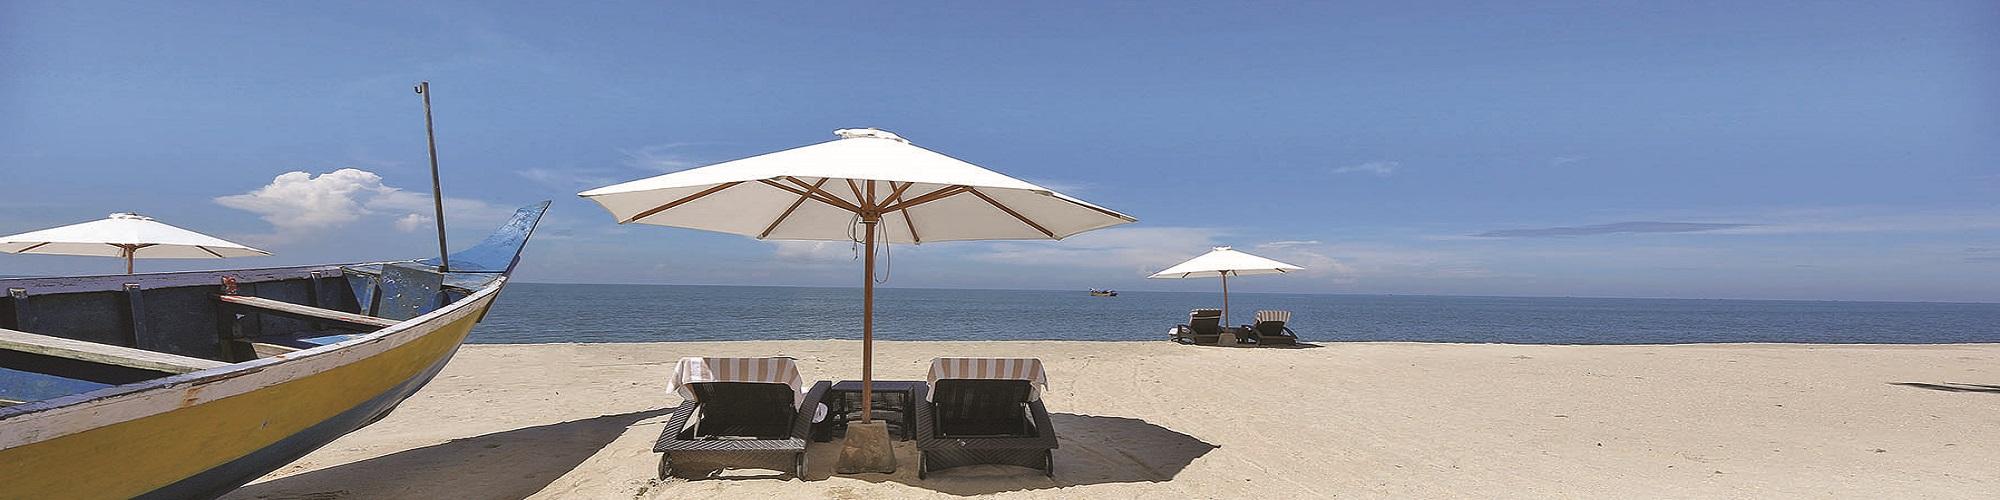 carnoustie Beach kerala